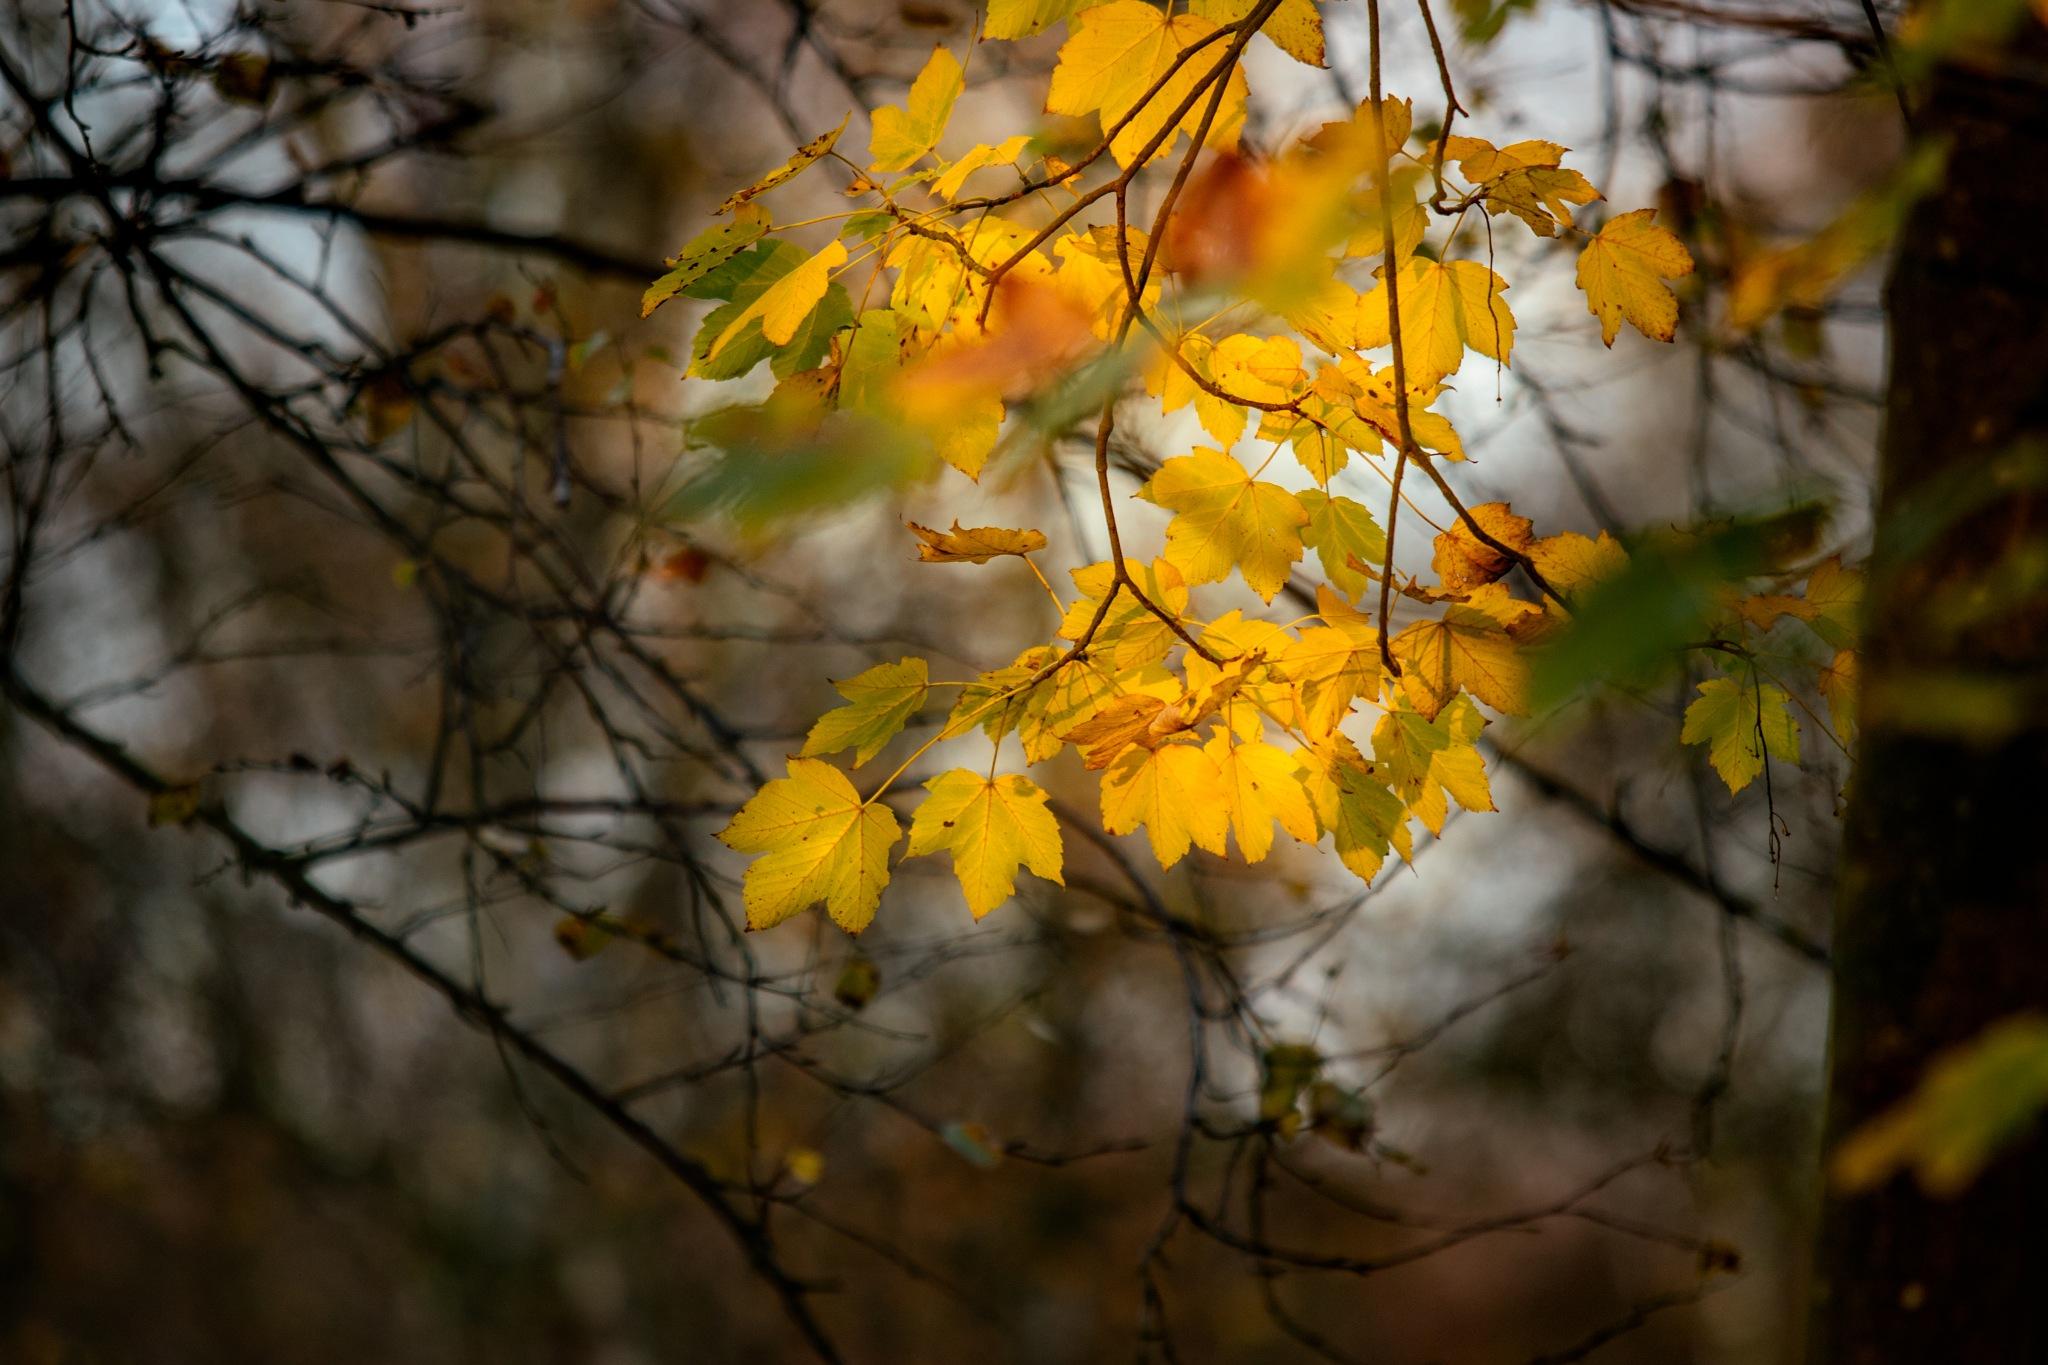 Autumn in the bog by Michael B. Rasmussen